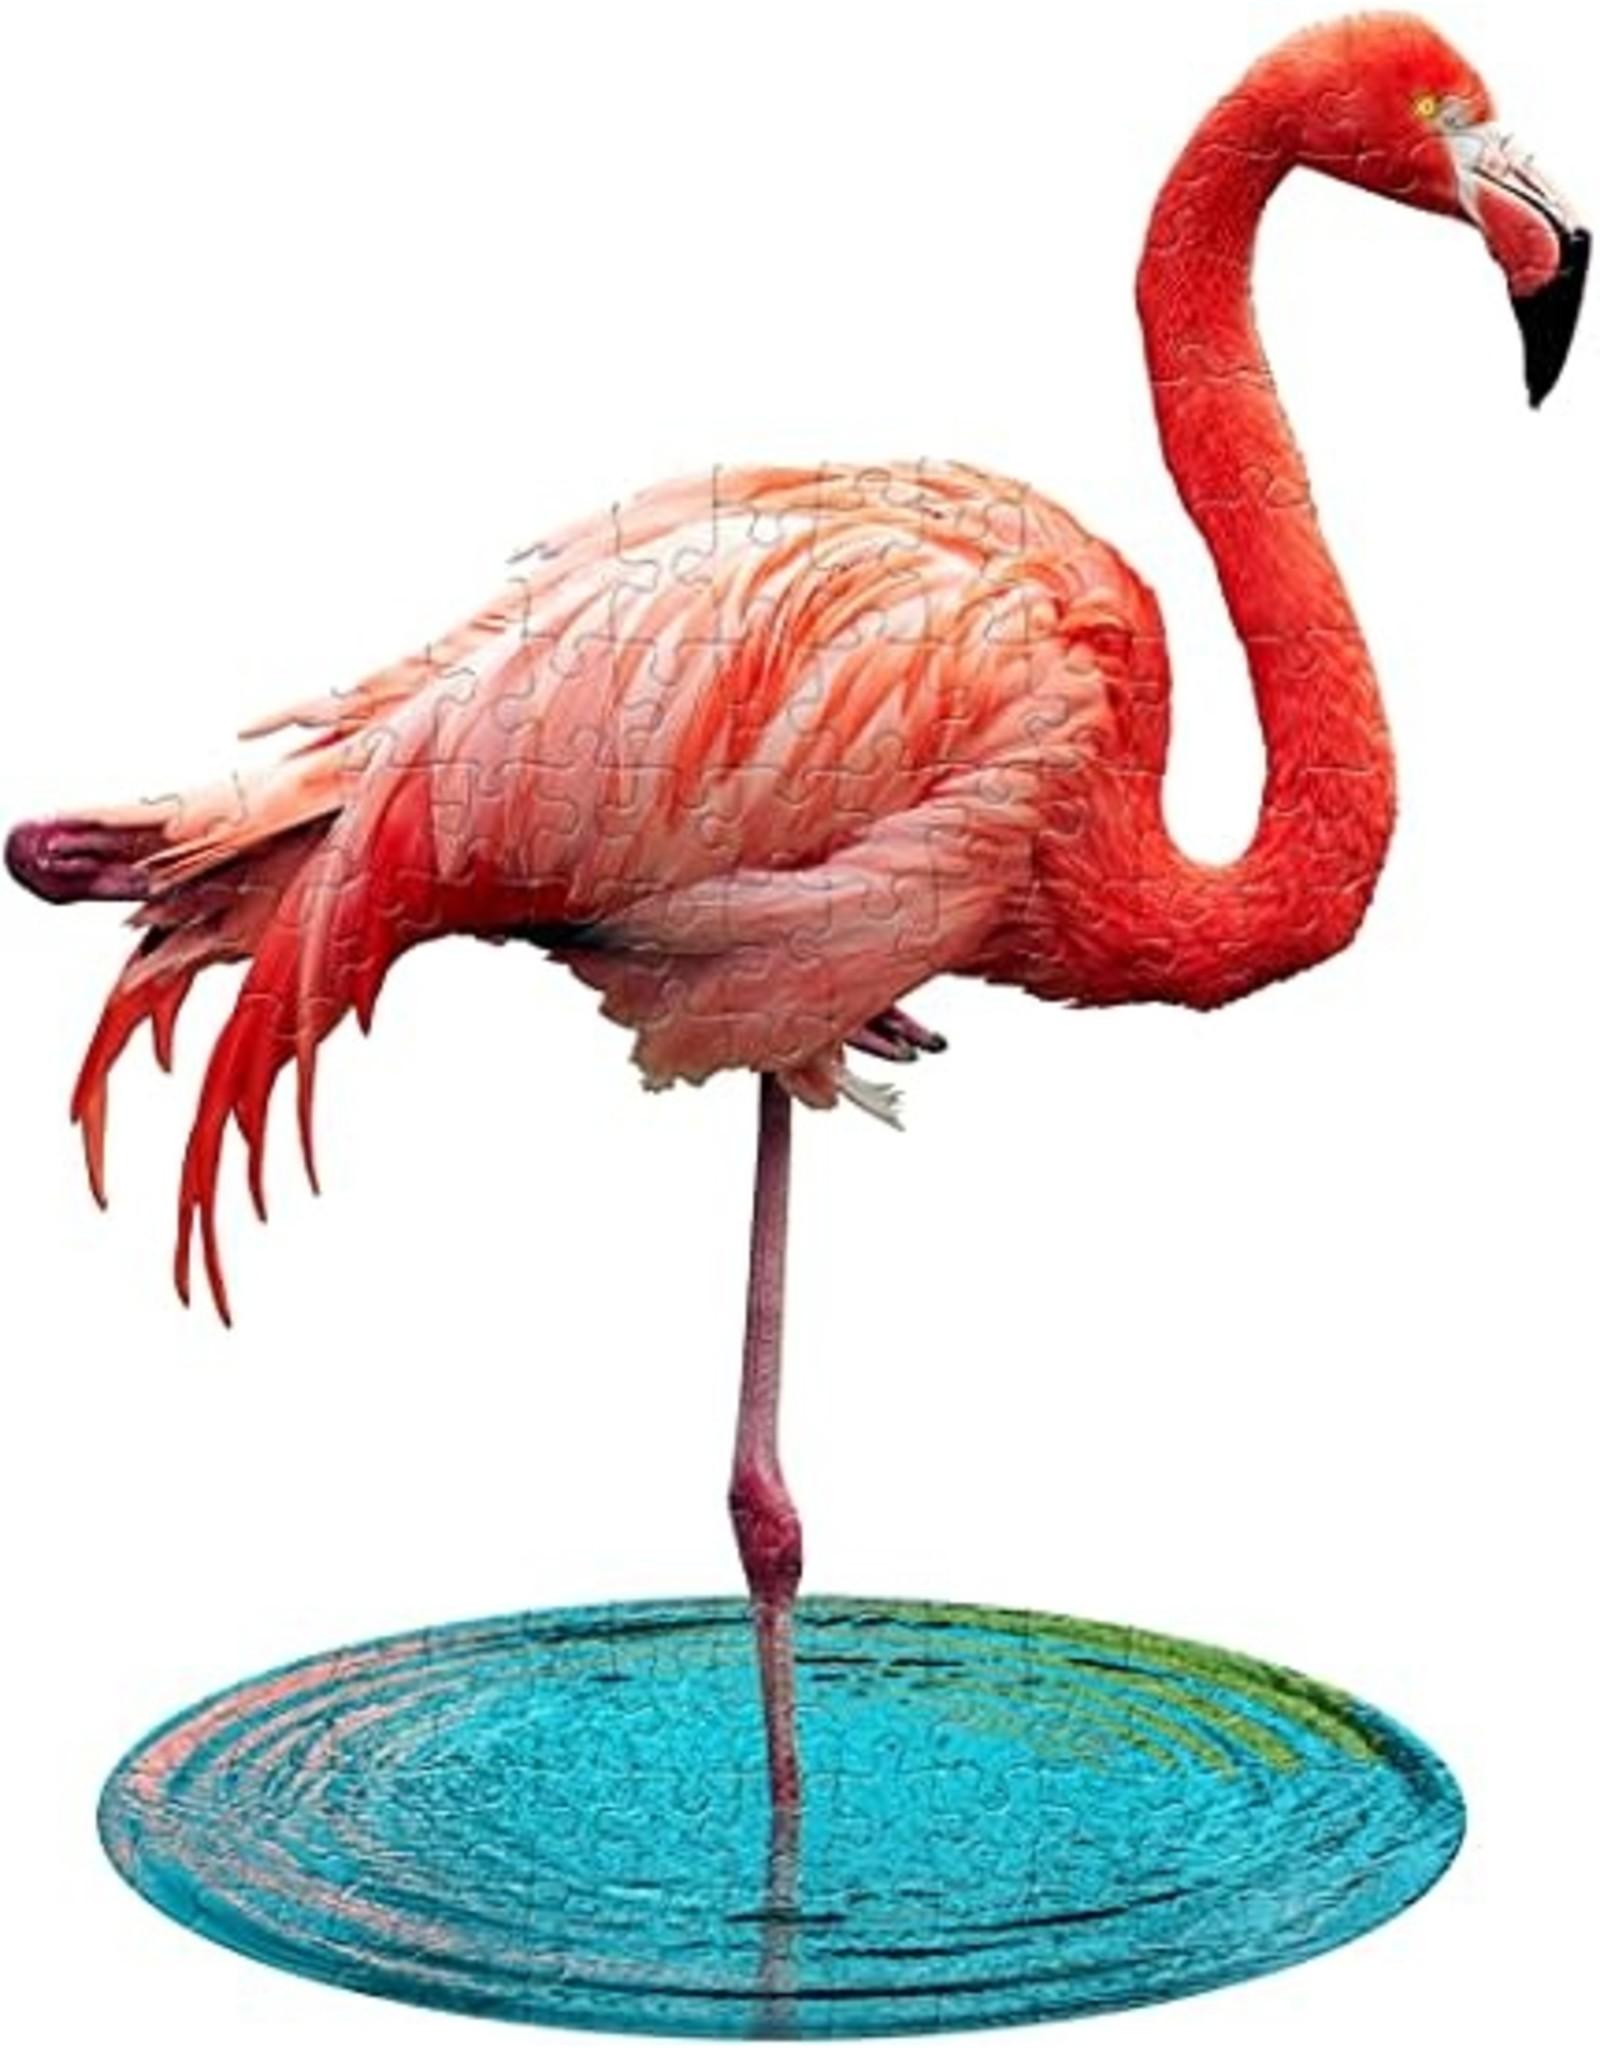 Madd Capp 100 pcs. I Am Lil Flamingo Shaped Puzzle